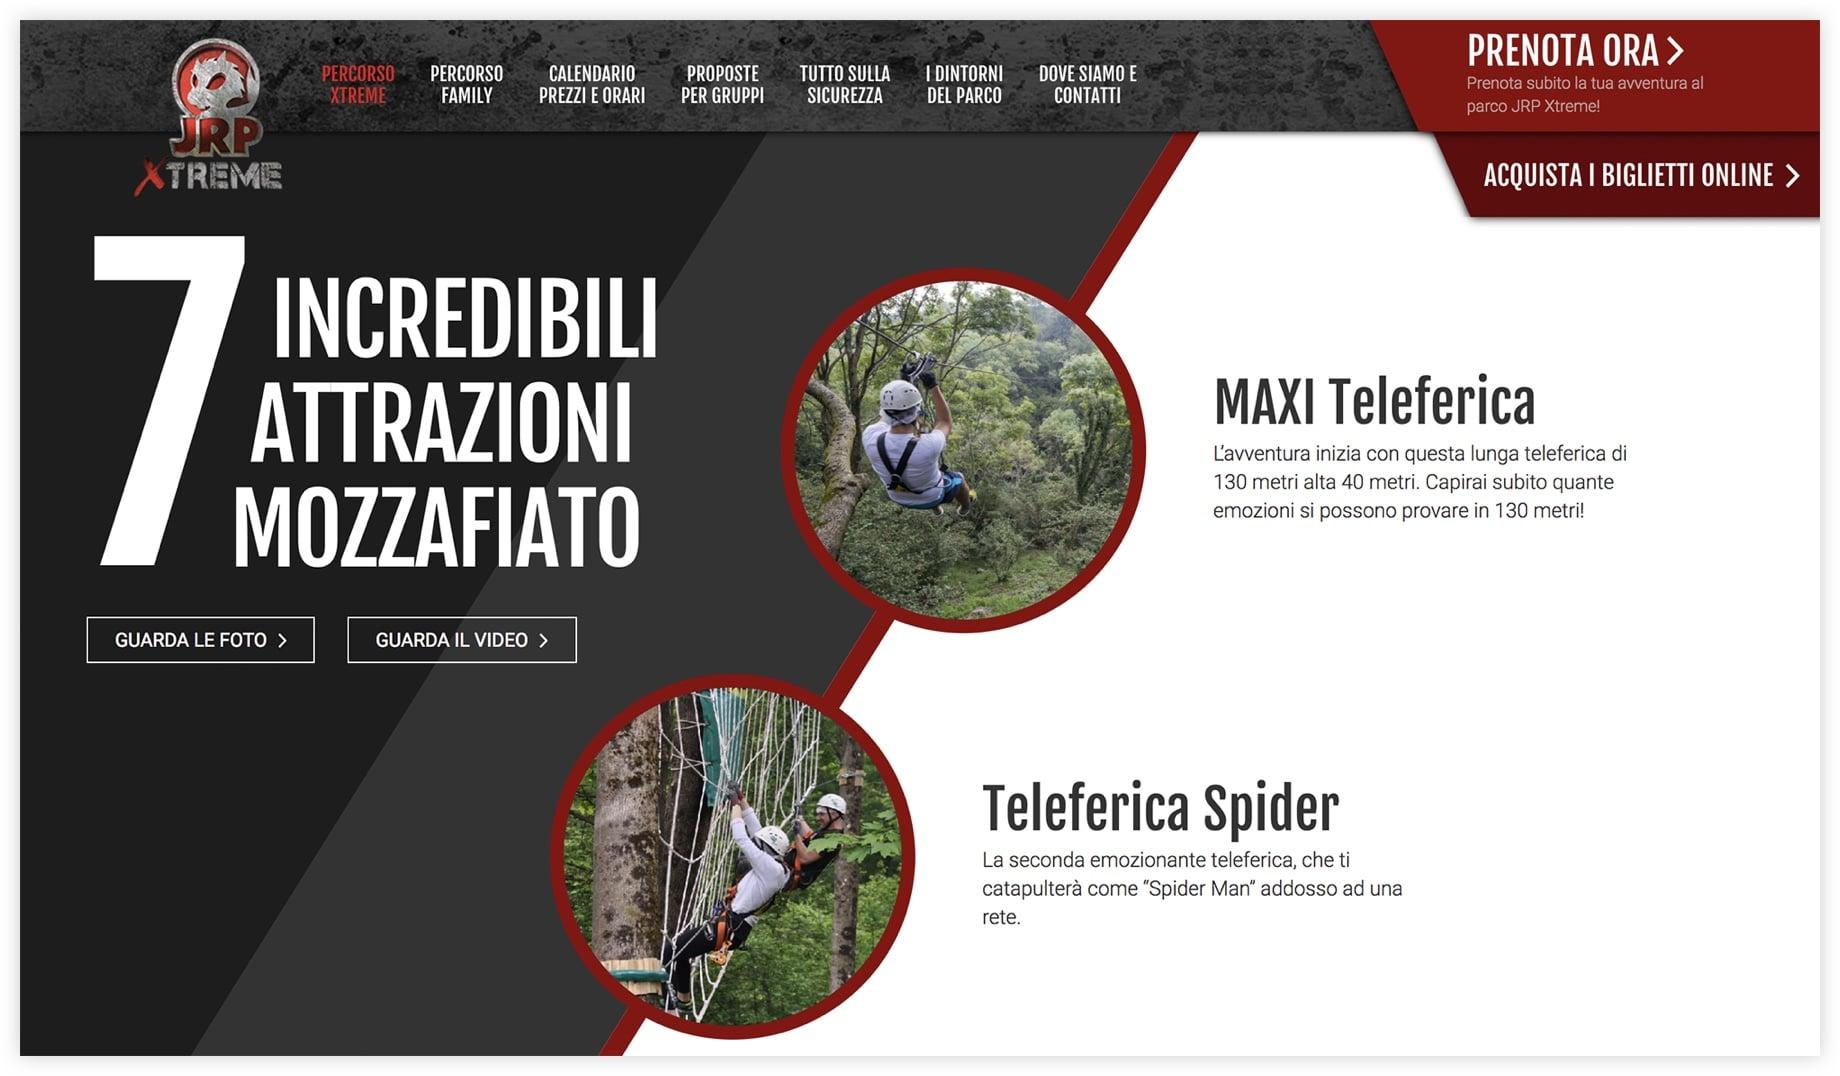 Sito web JRP Xtreme - Como